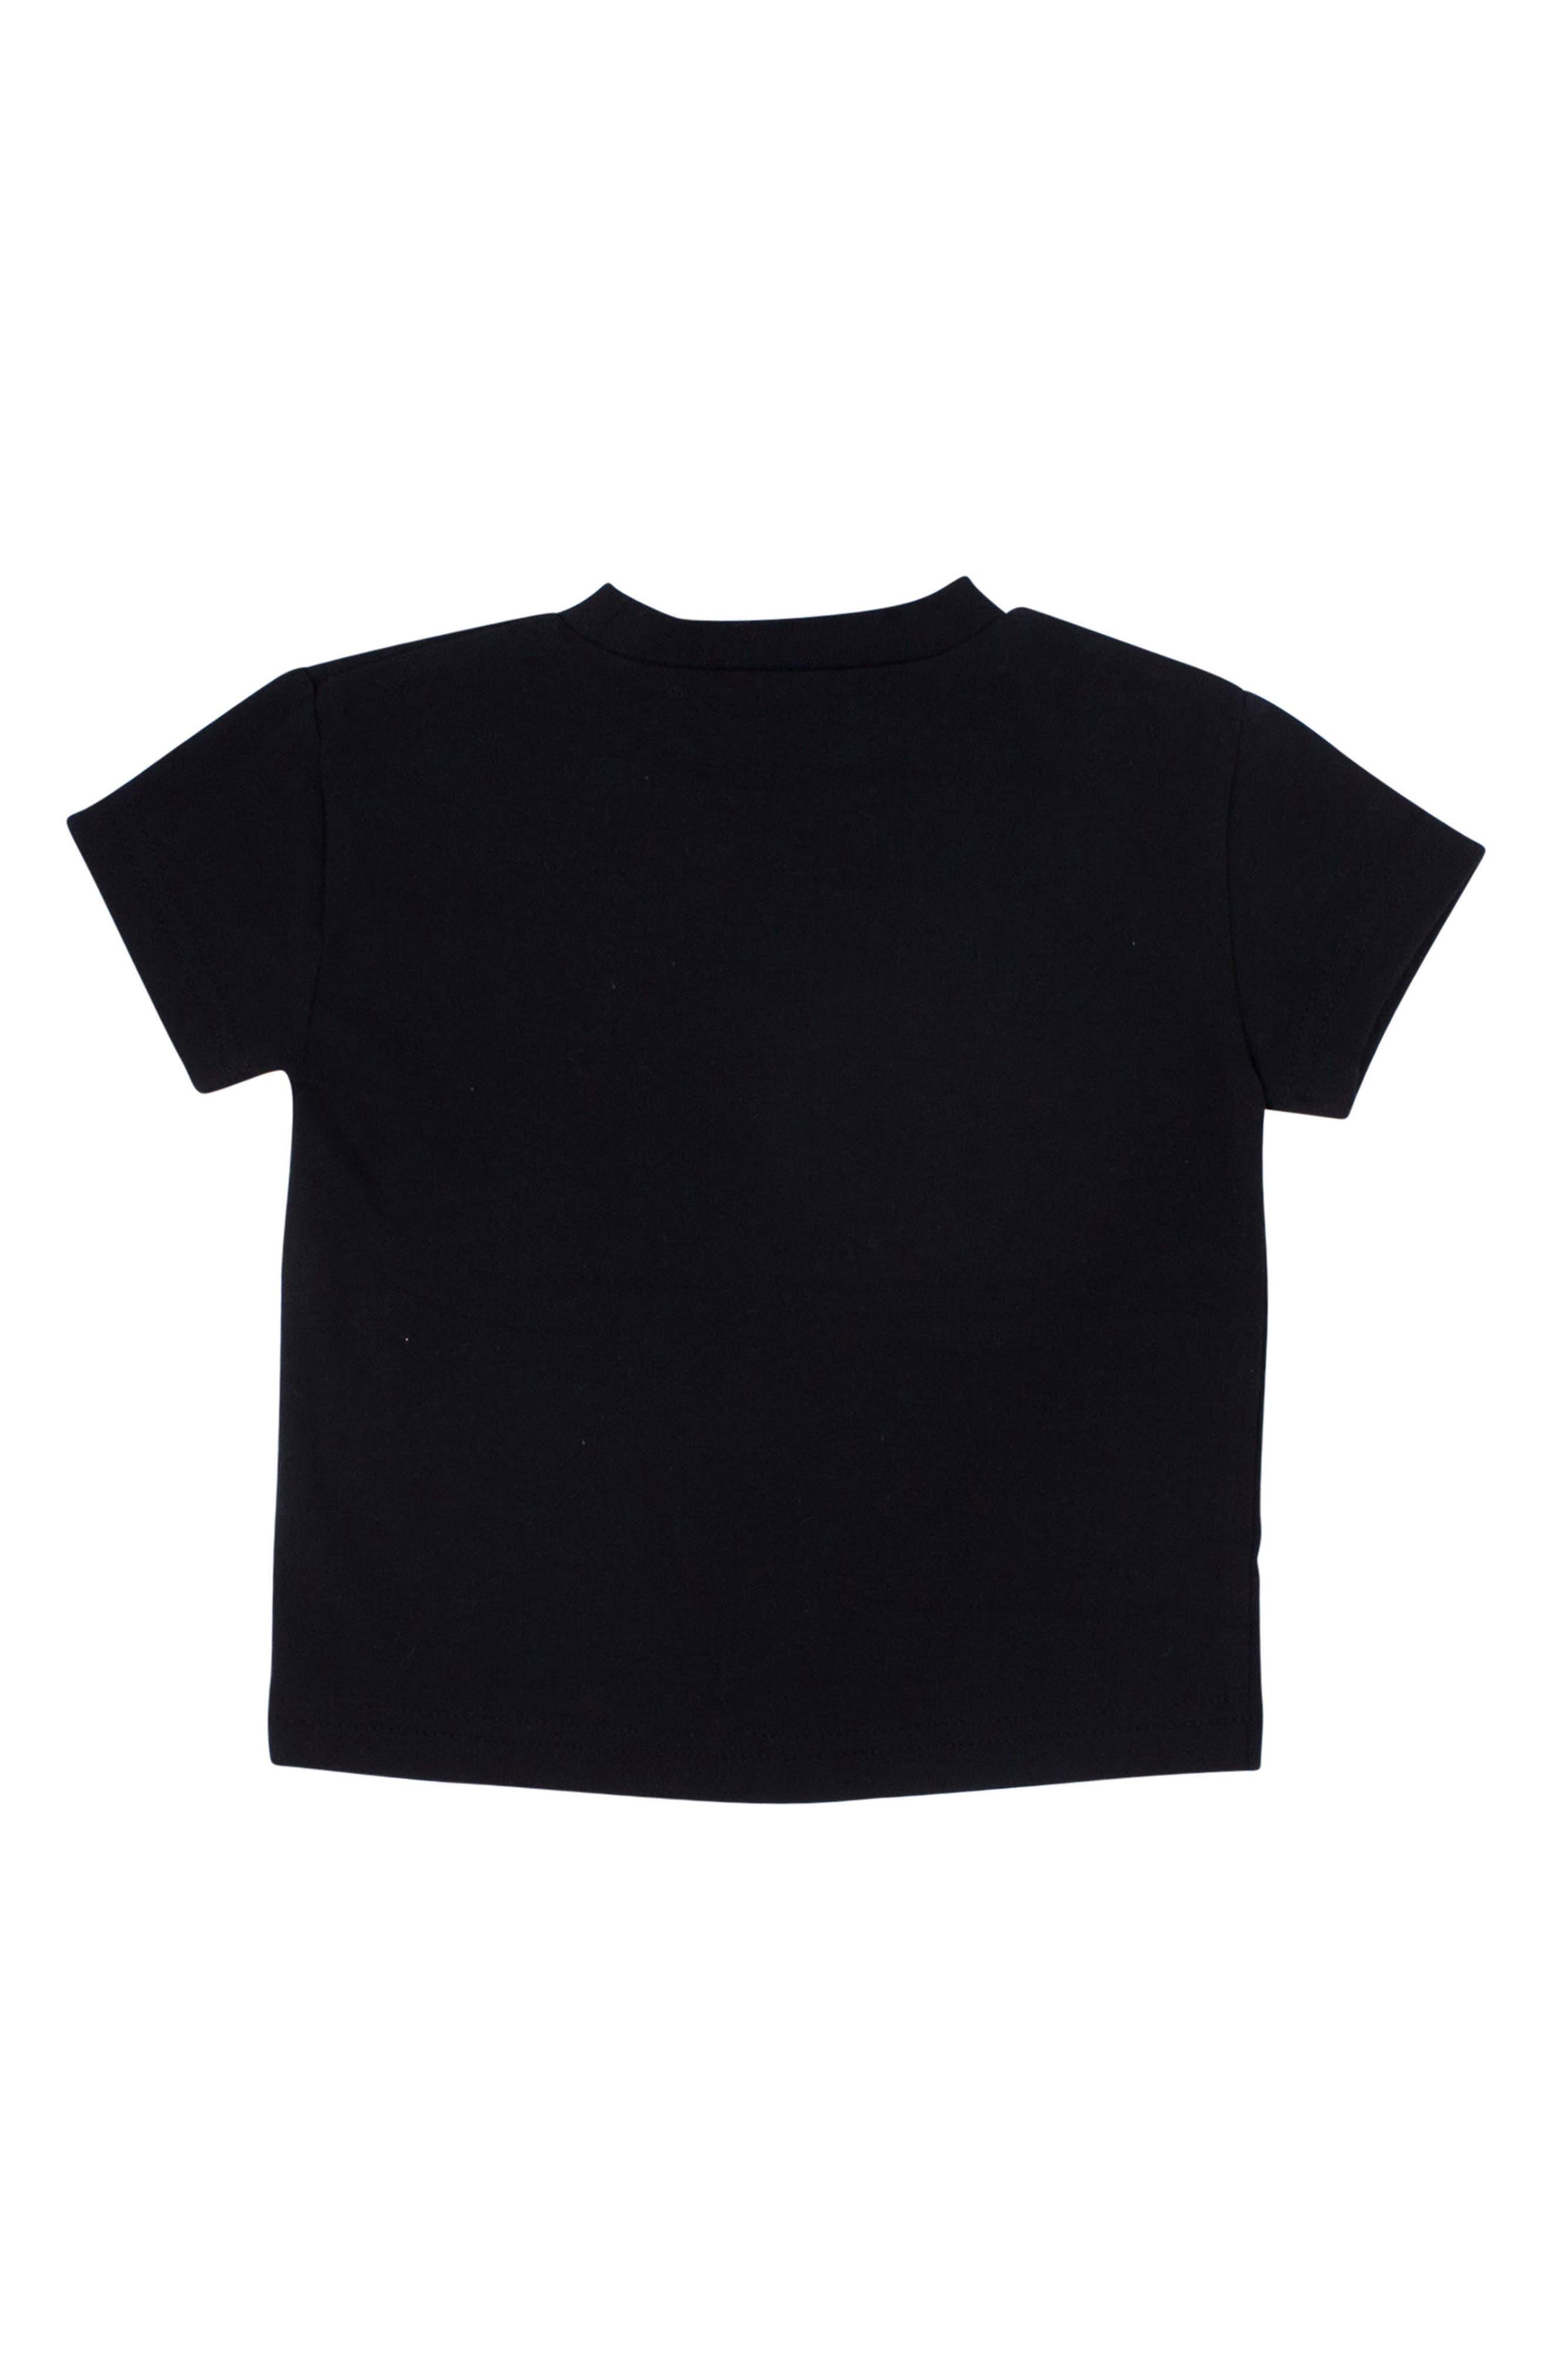 Chicken Nuggets T-Shirt,                             Alternate thumbnail 2, color,                             Black